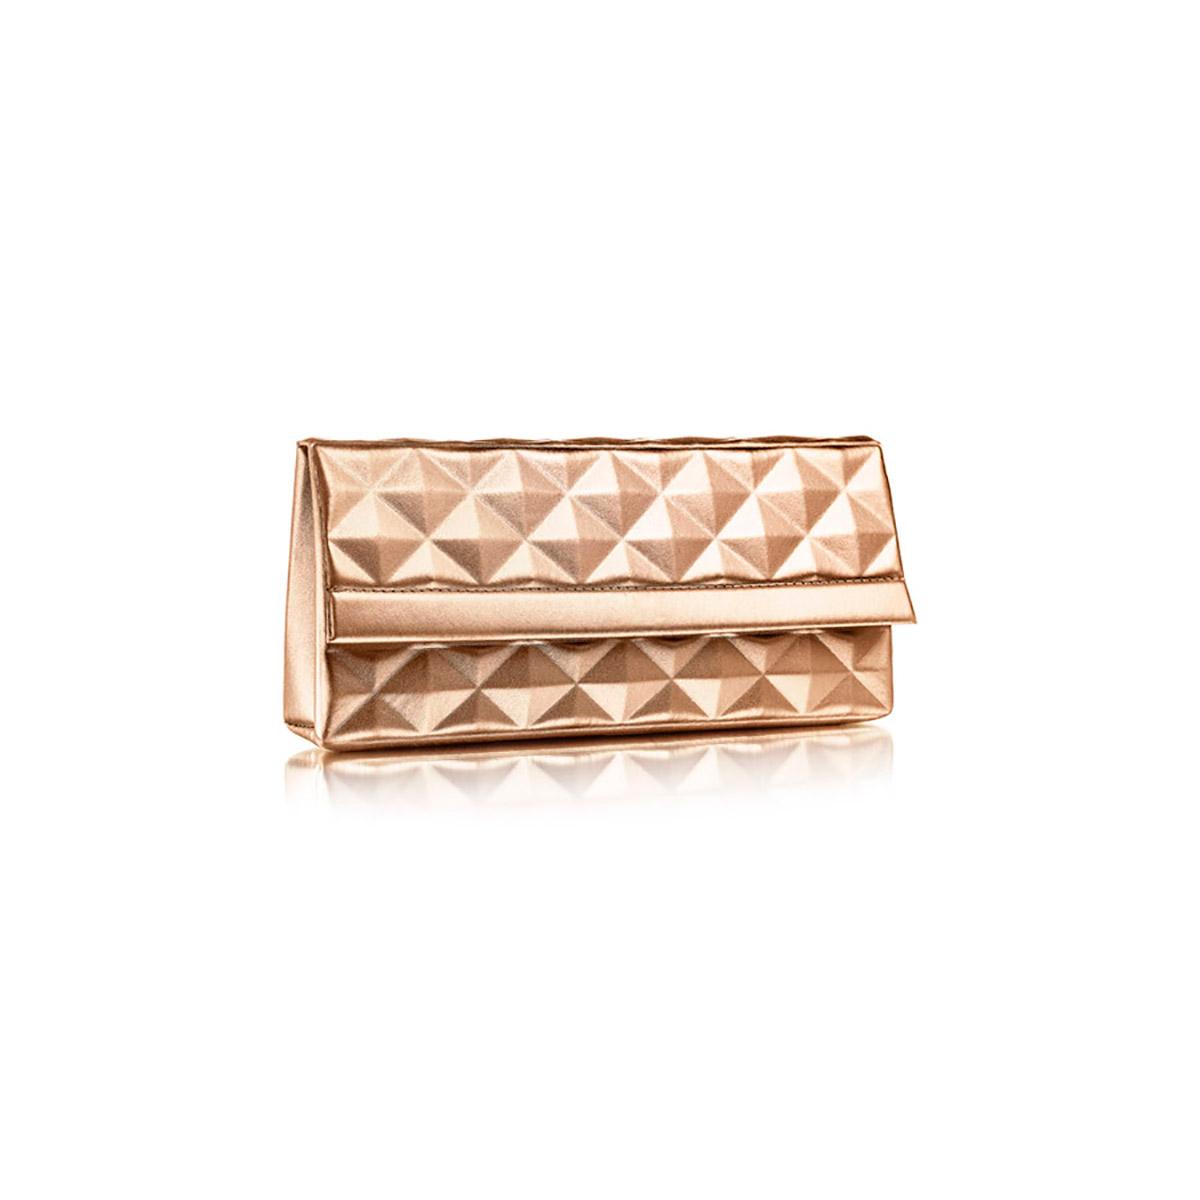 Bolsa-clutch Dourada Essencial Exclusiva - 58866